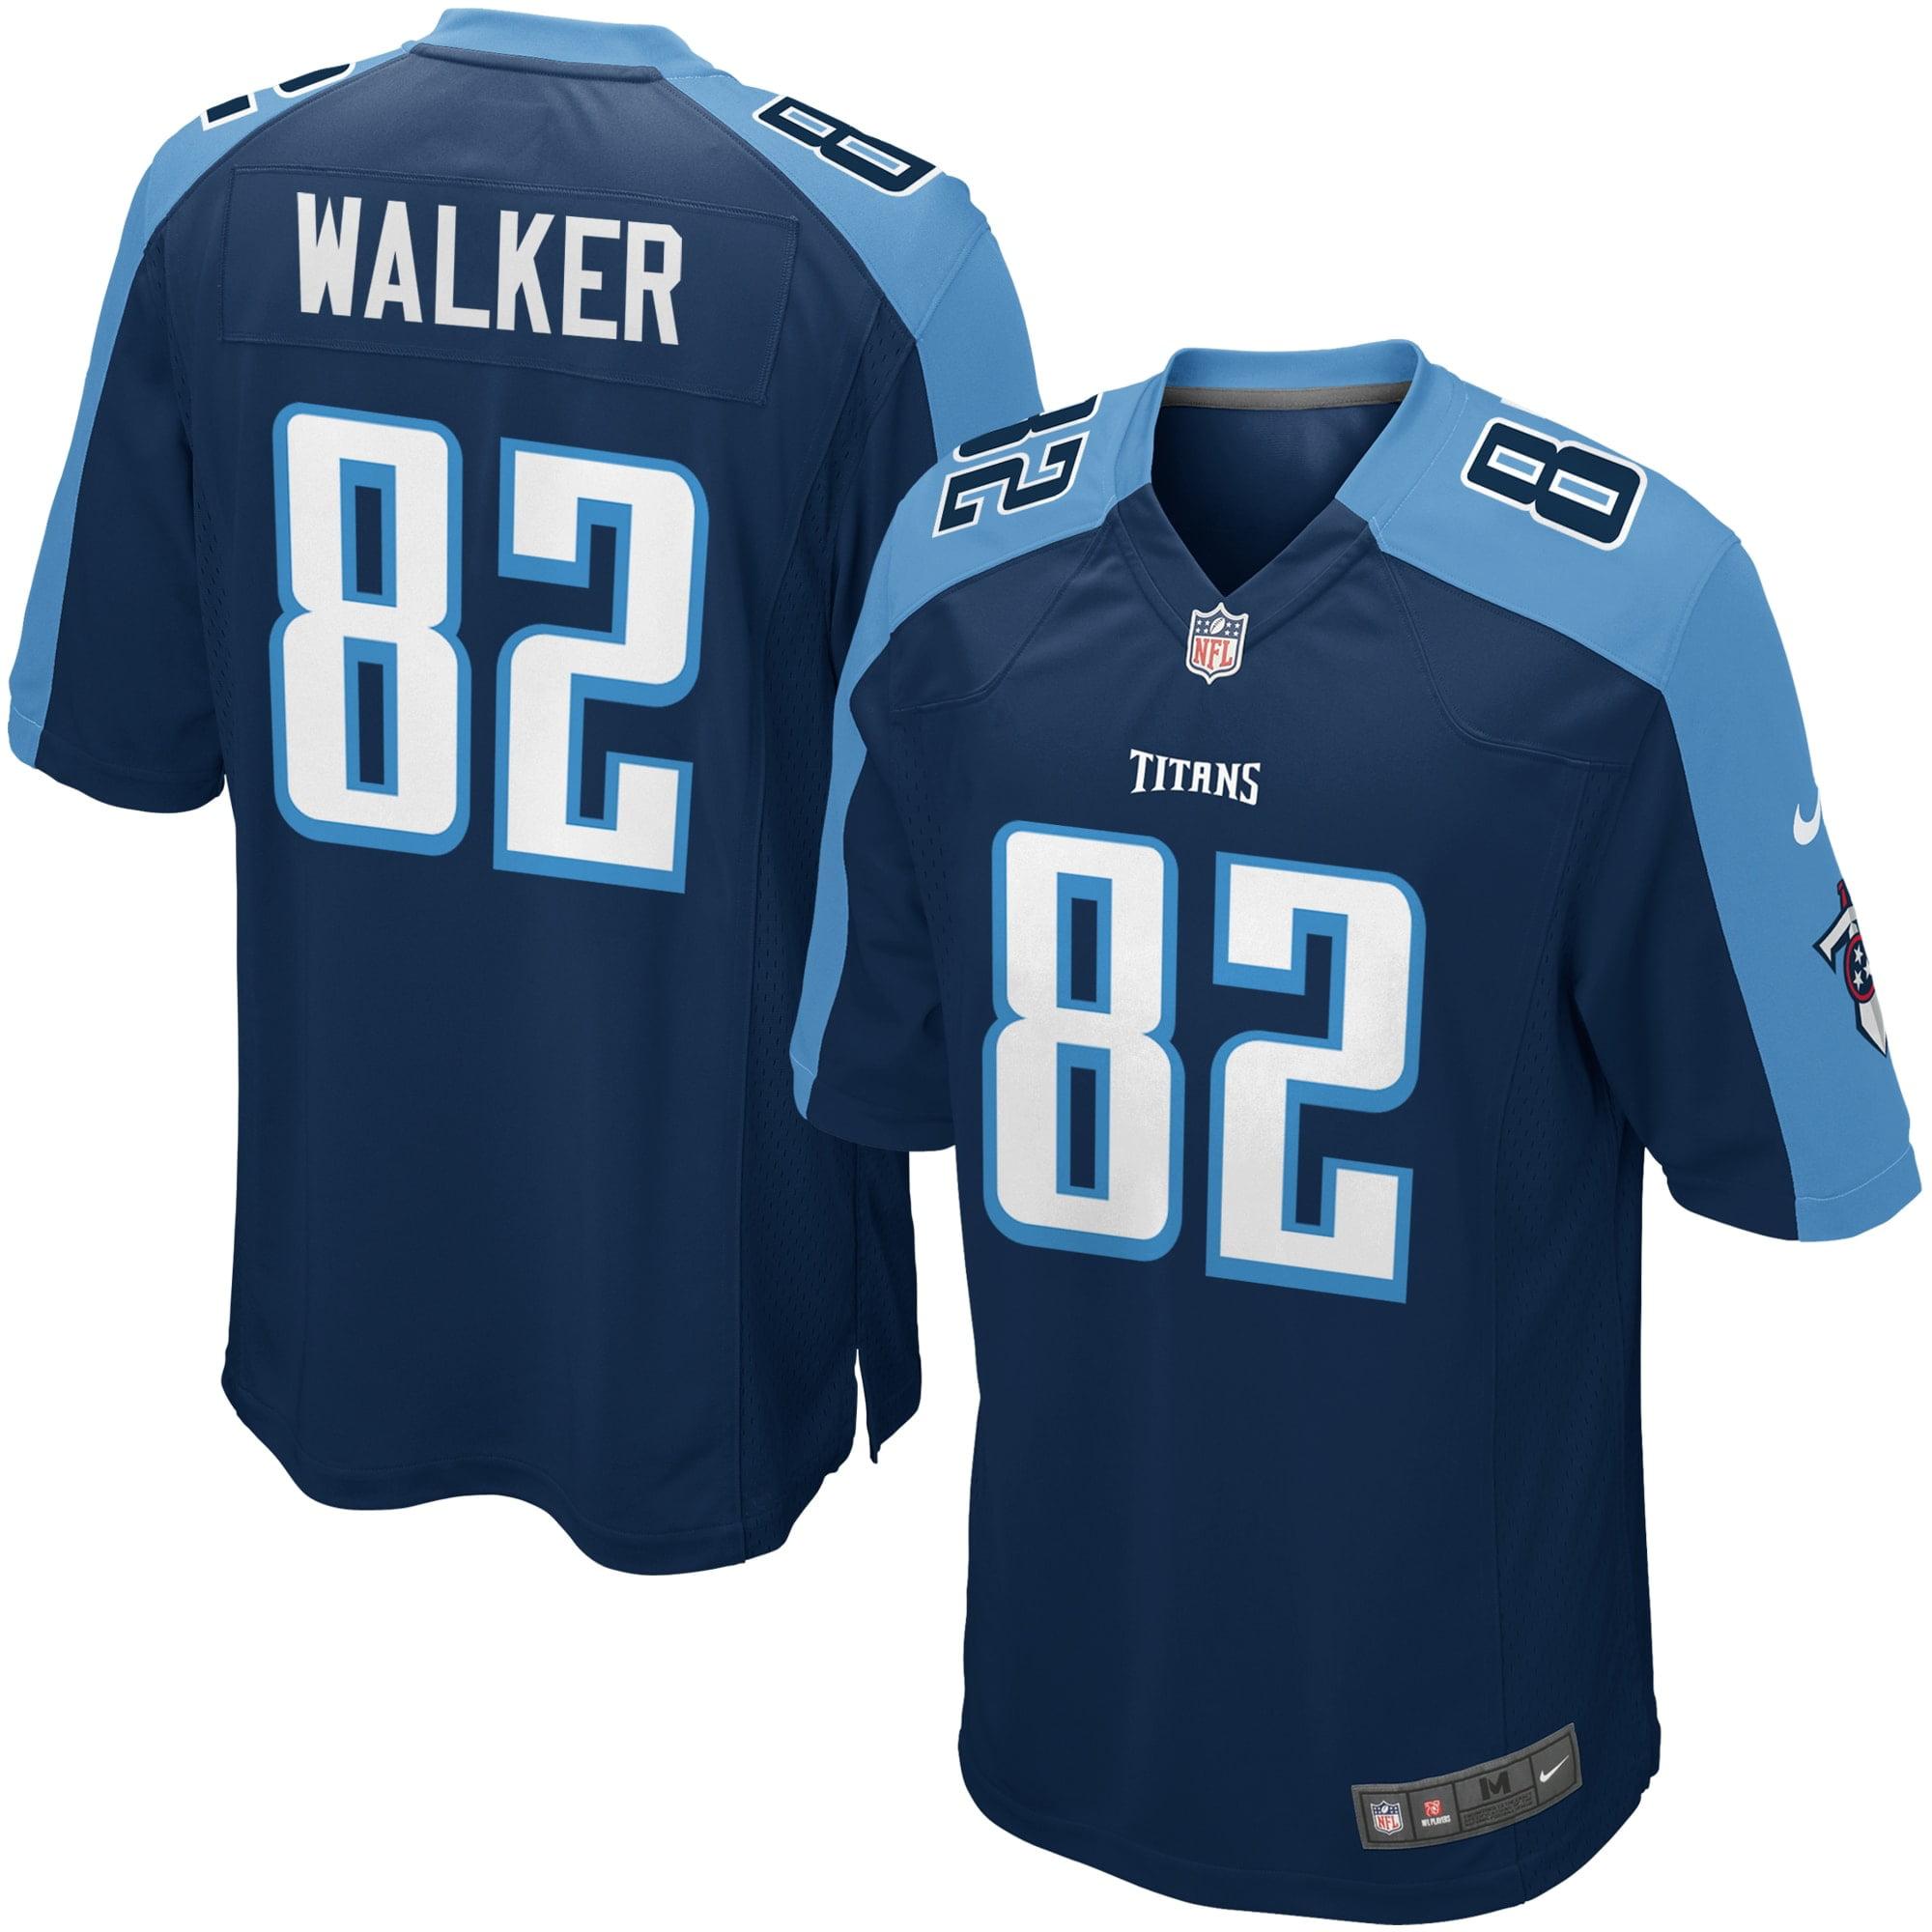 Delanie Walker Tennessee Titans Nike Youth Alternate Game Jersey - Navy Blue - Walmart.com